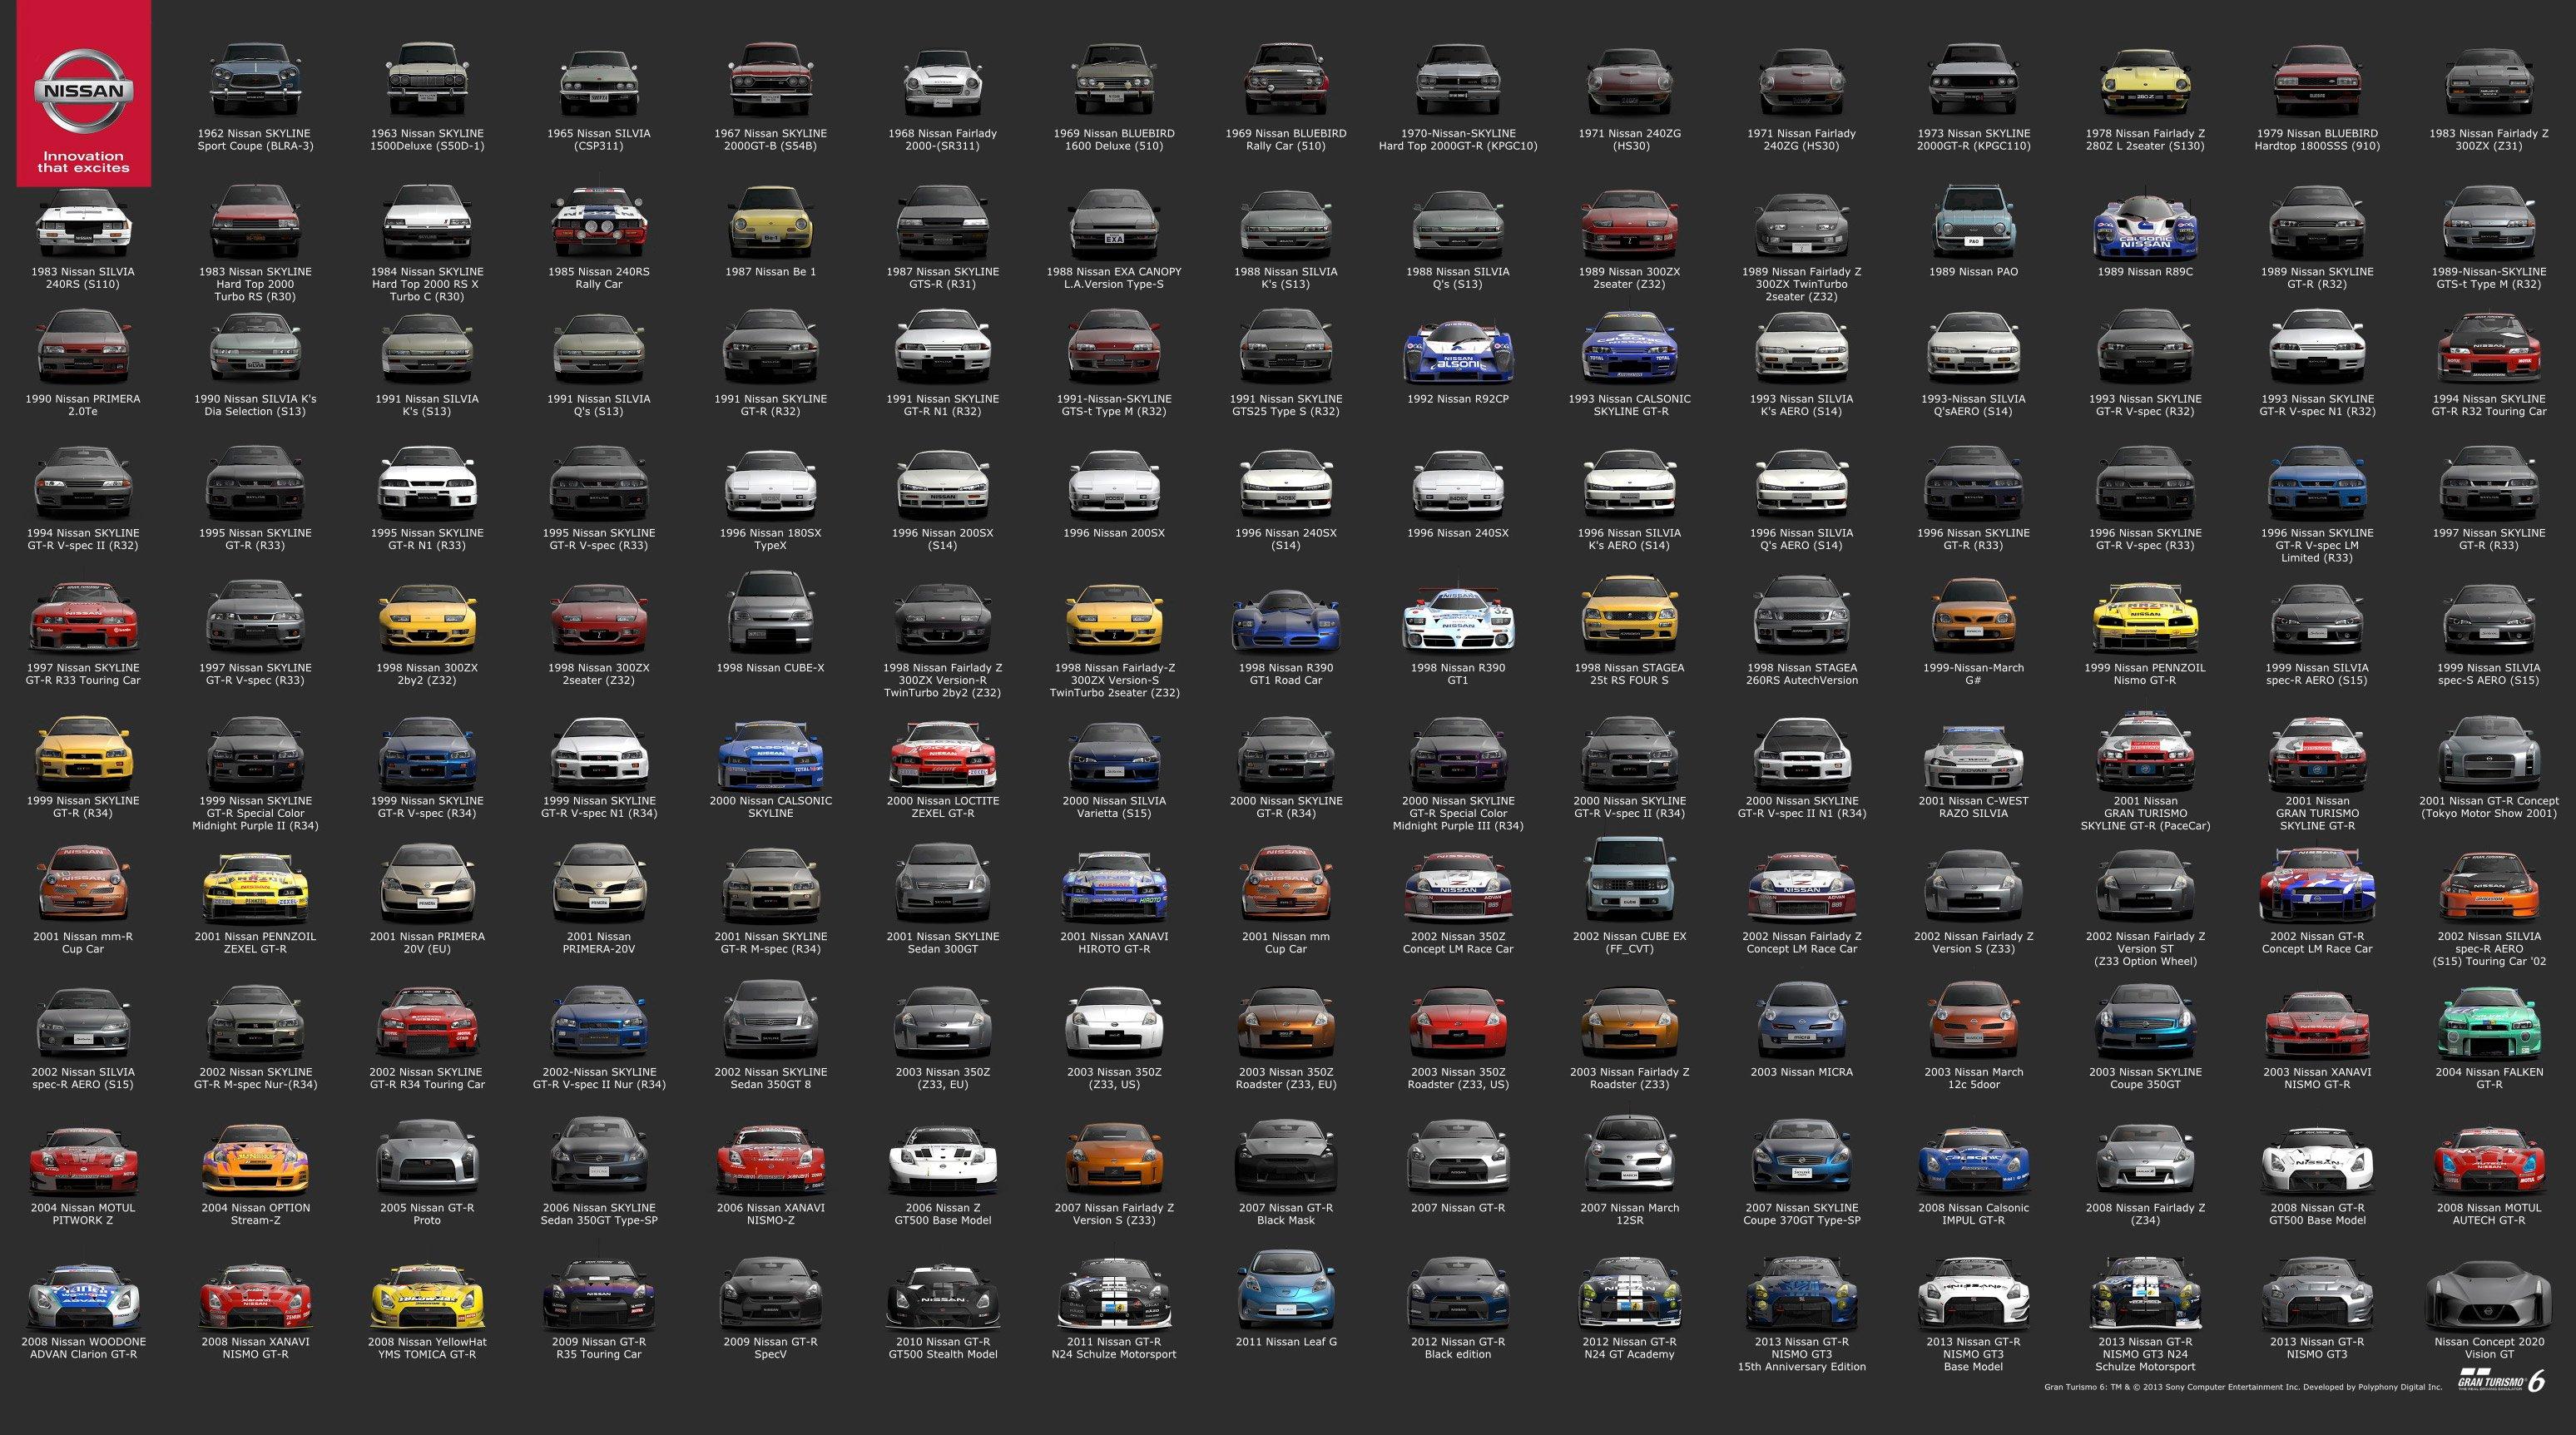 The History Of Nissan Cars Via Gran Turismo 95 Octane